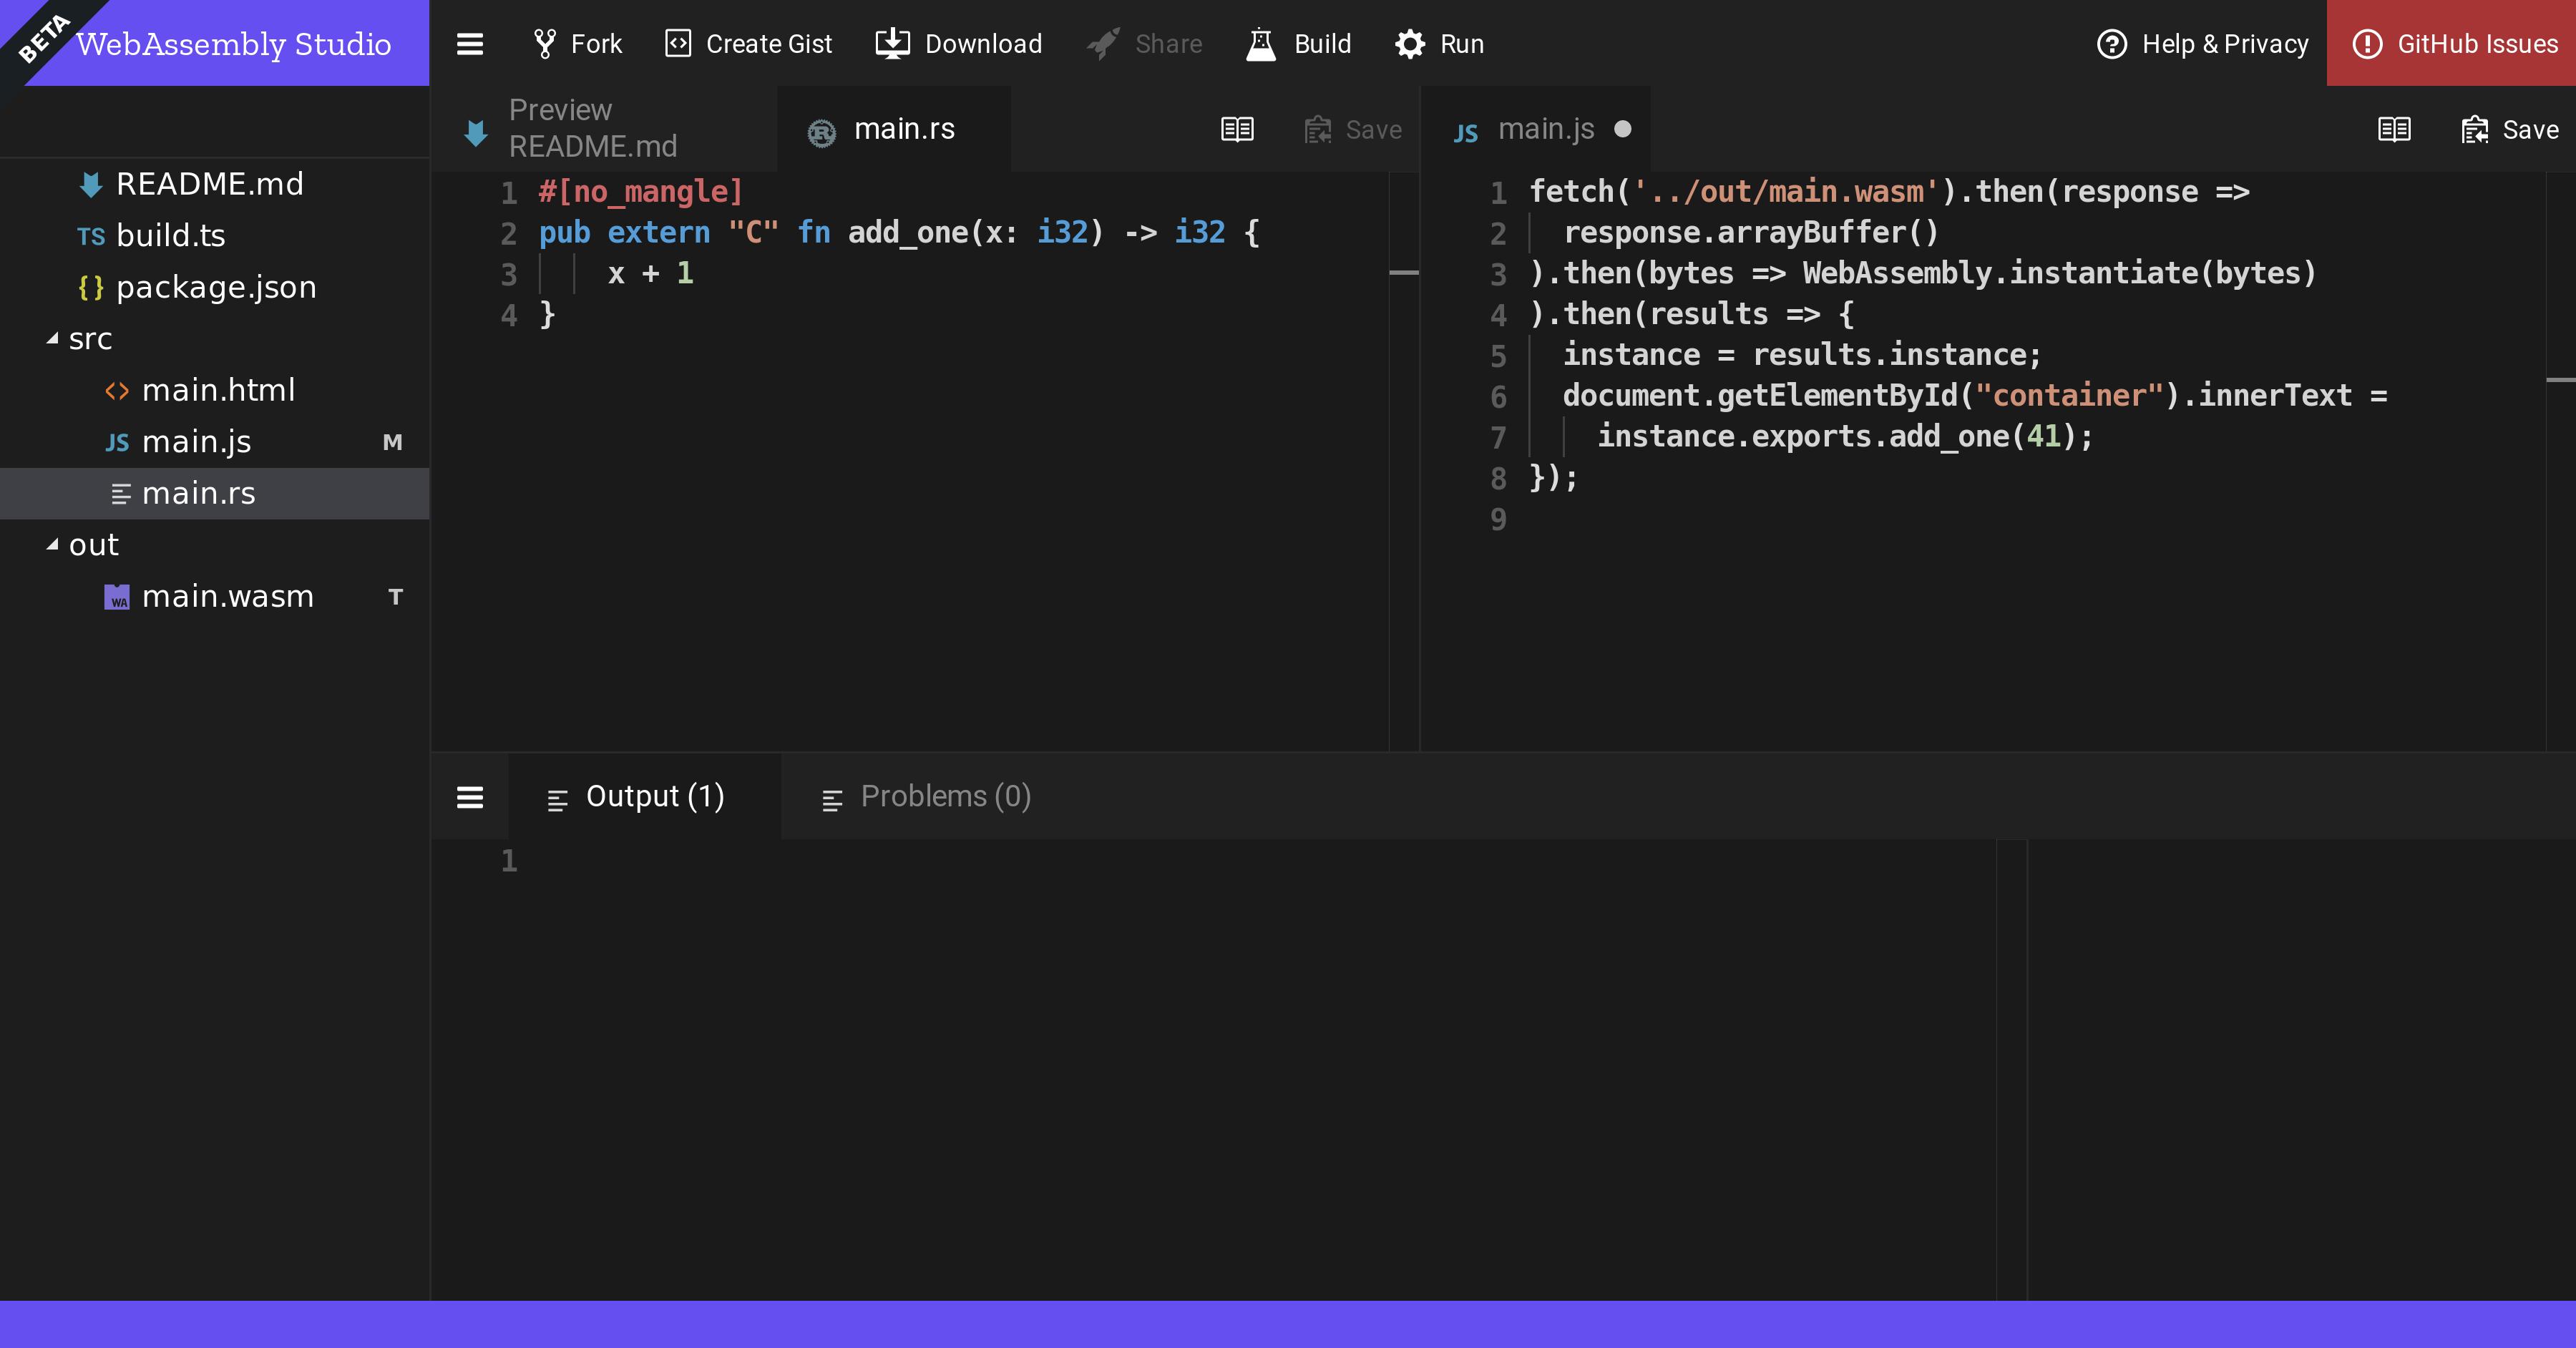 Sneak Peek at WebAssembly Studio - Mozilla Hacks - the Web